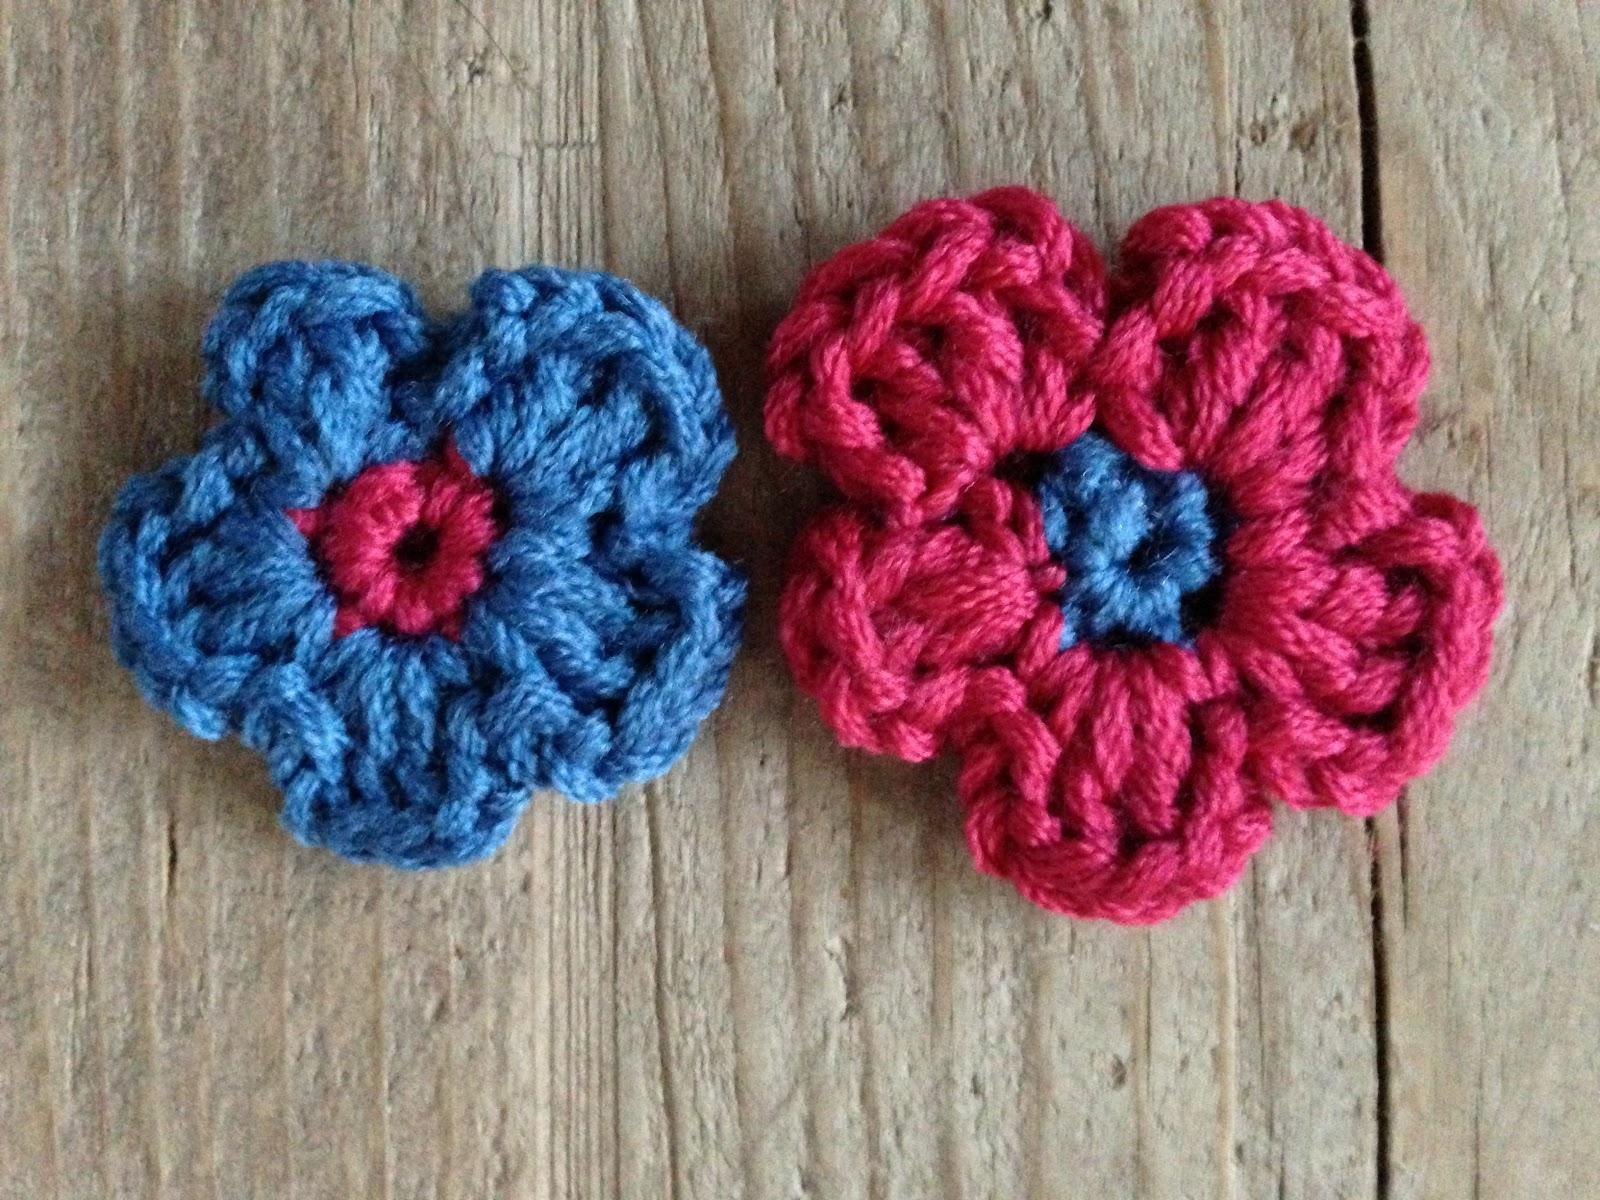 Annoos Crochet World Beginners Crochet Free Flower Tutorial